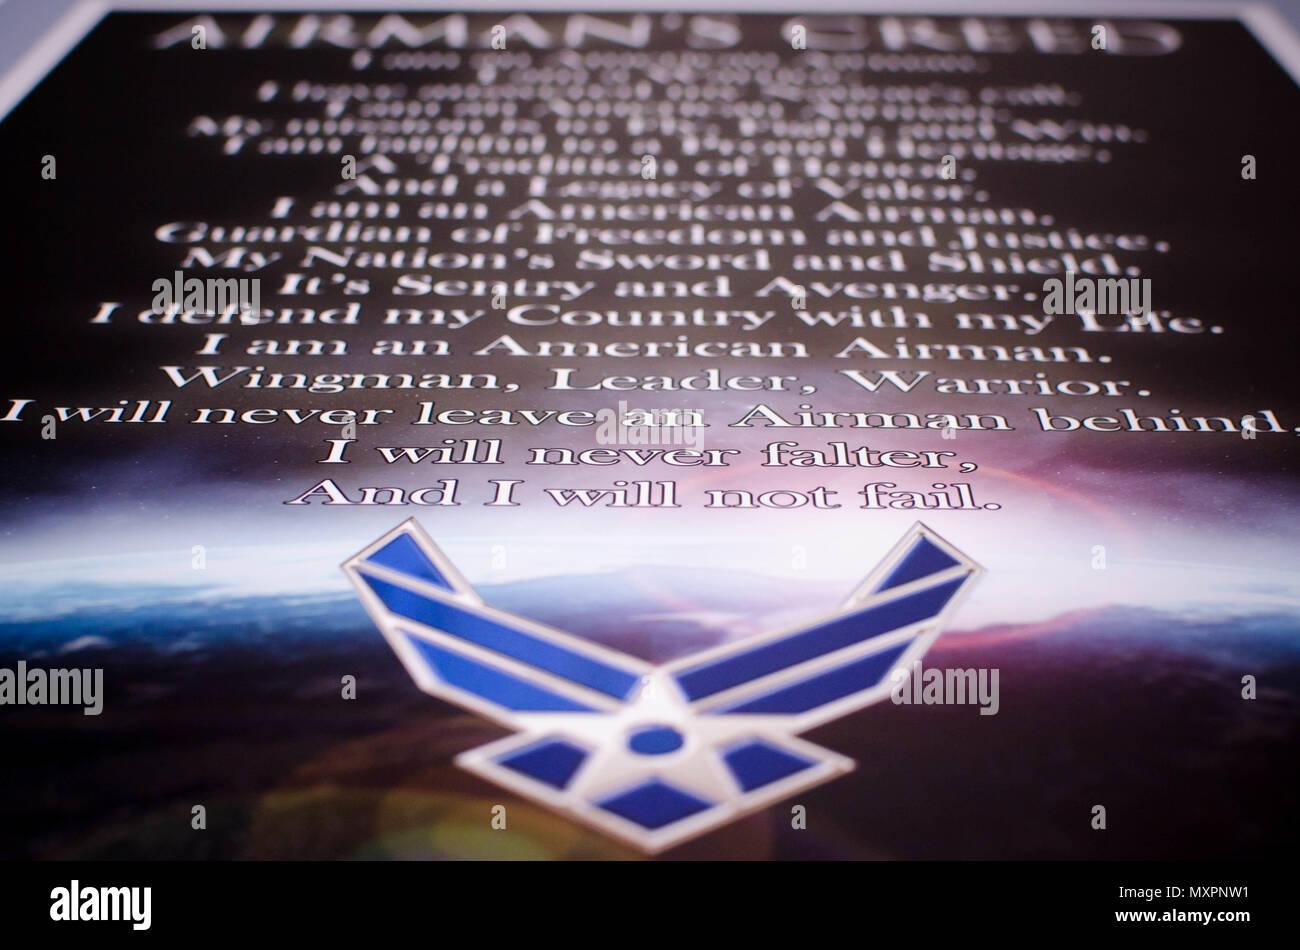 The airmans creedus air force photostaff sgt heather heiney the airmans creedus air force photostaff sgt heather heiney thecheapjerseys Images